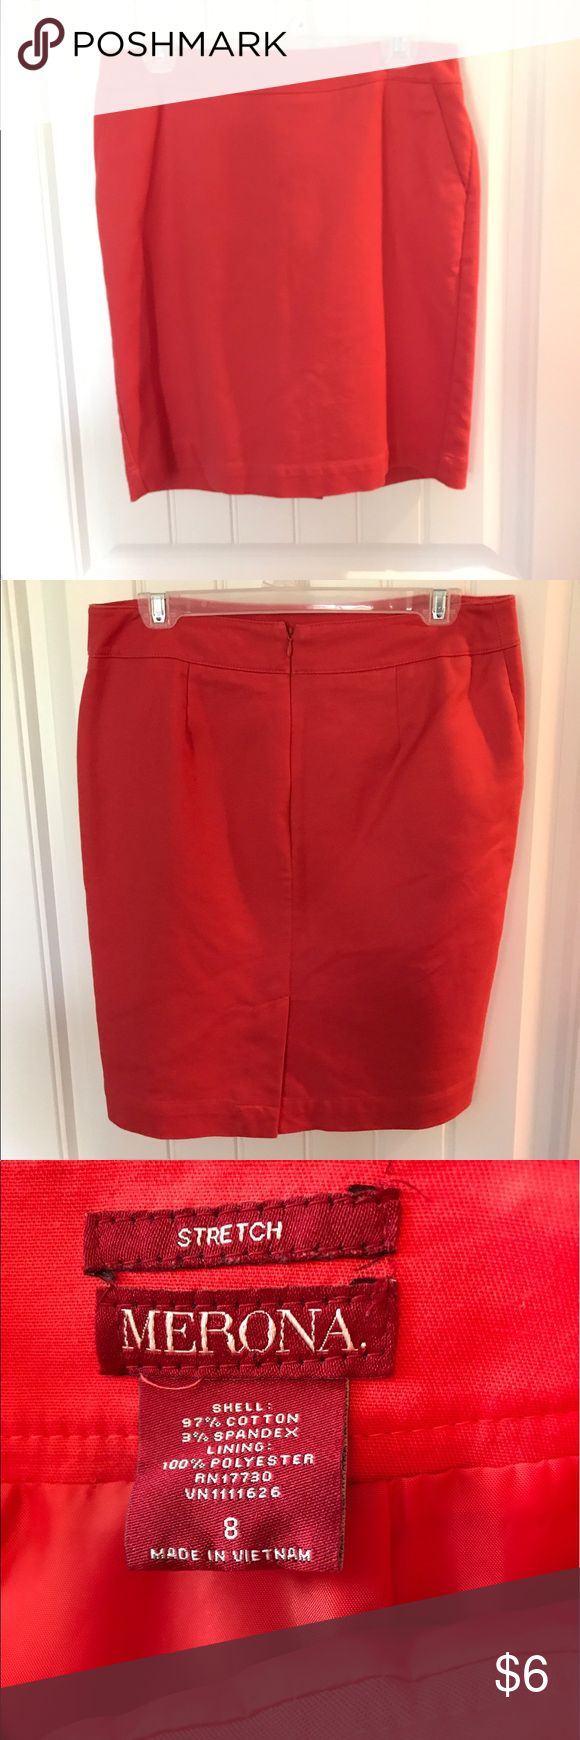 Merona coral pencil skirt Stretch fabric! Merona Skirts Pencil